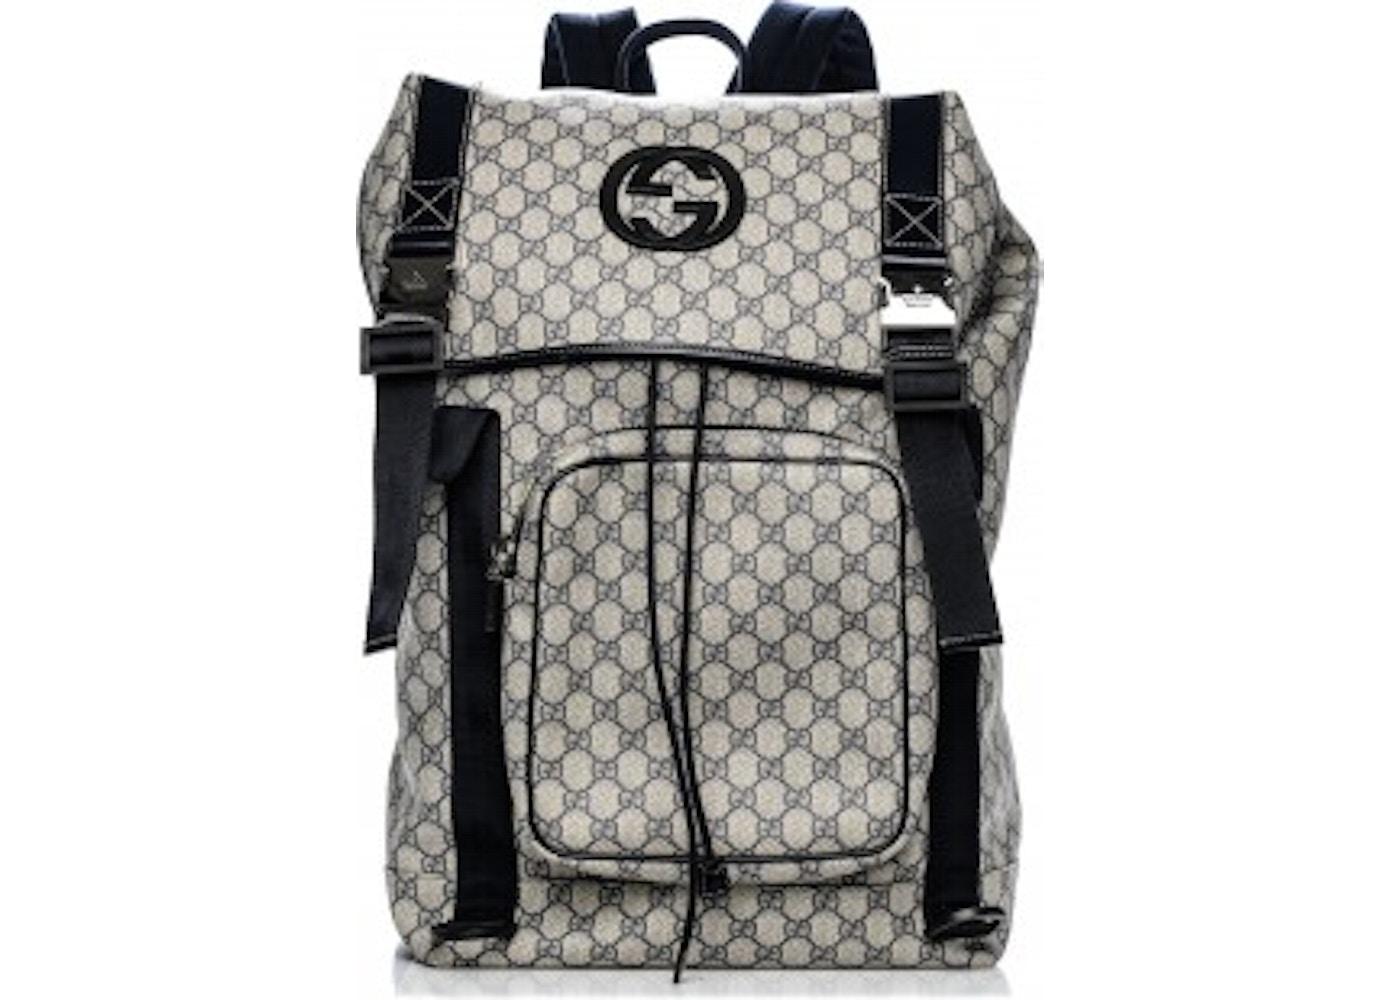 9d1d377203a Gucci GG Supreme Backpack Monogram Interlocking G Navy